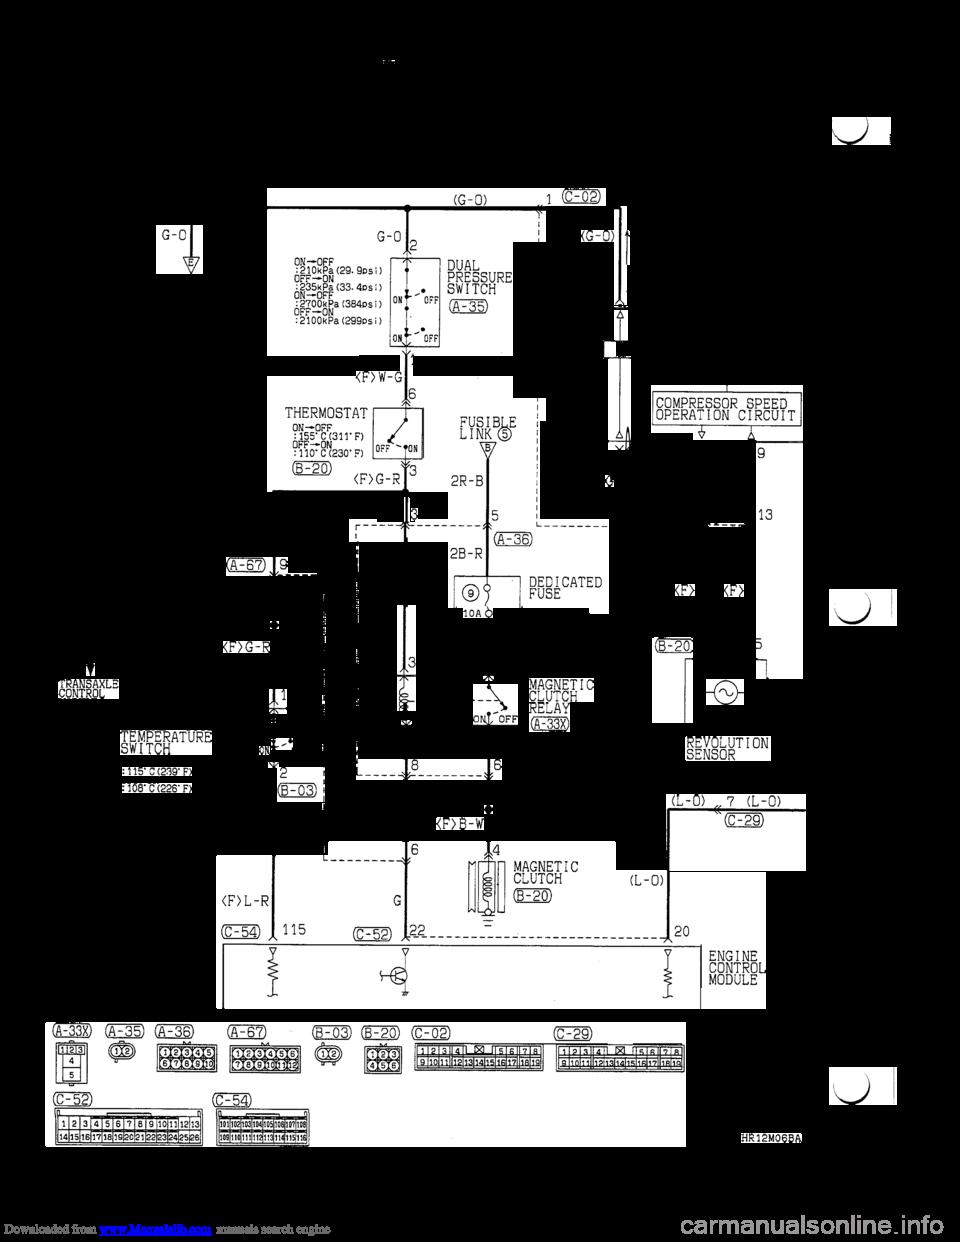 Engine Coolant Mitsubishi 3000gt 1994 2g Workshop Manual Spark Plug Diagram Wiring Schematic Page 284